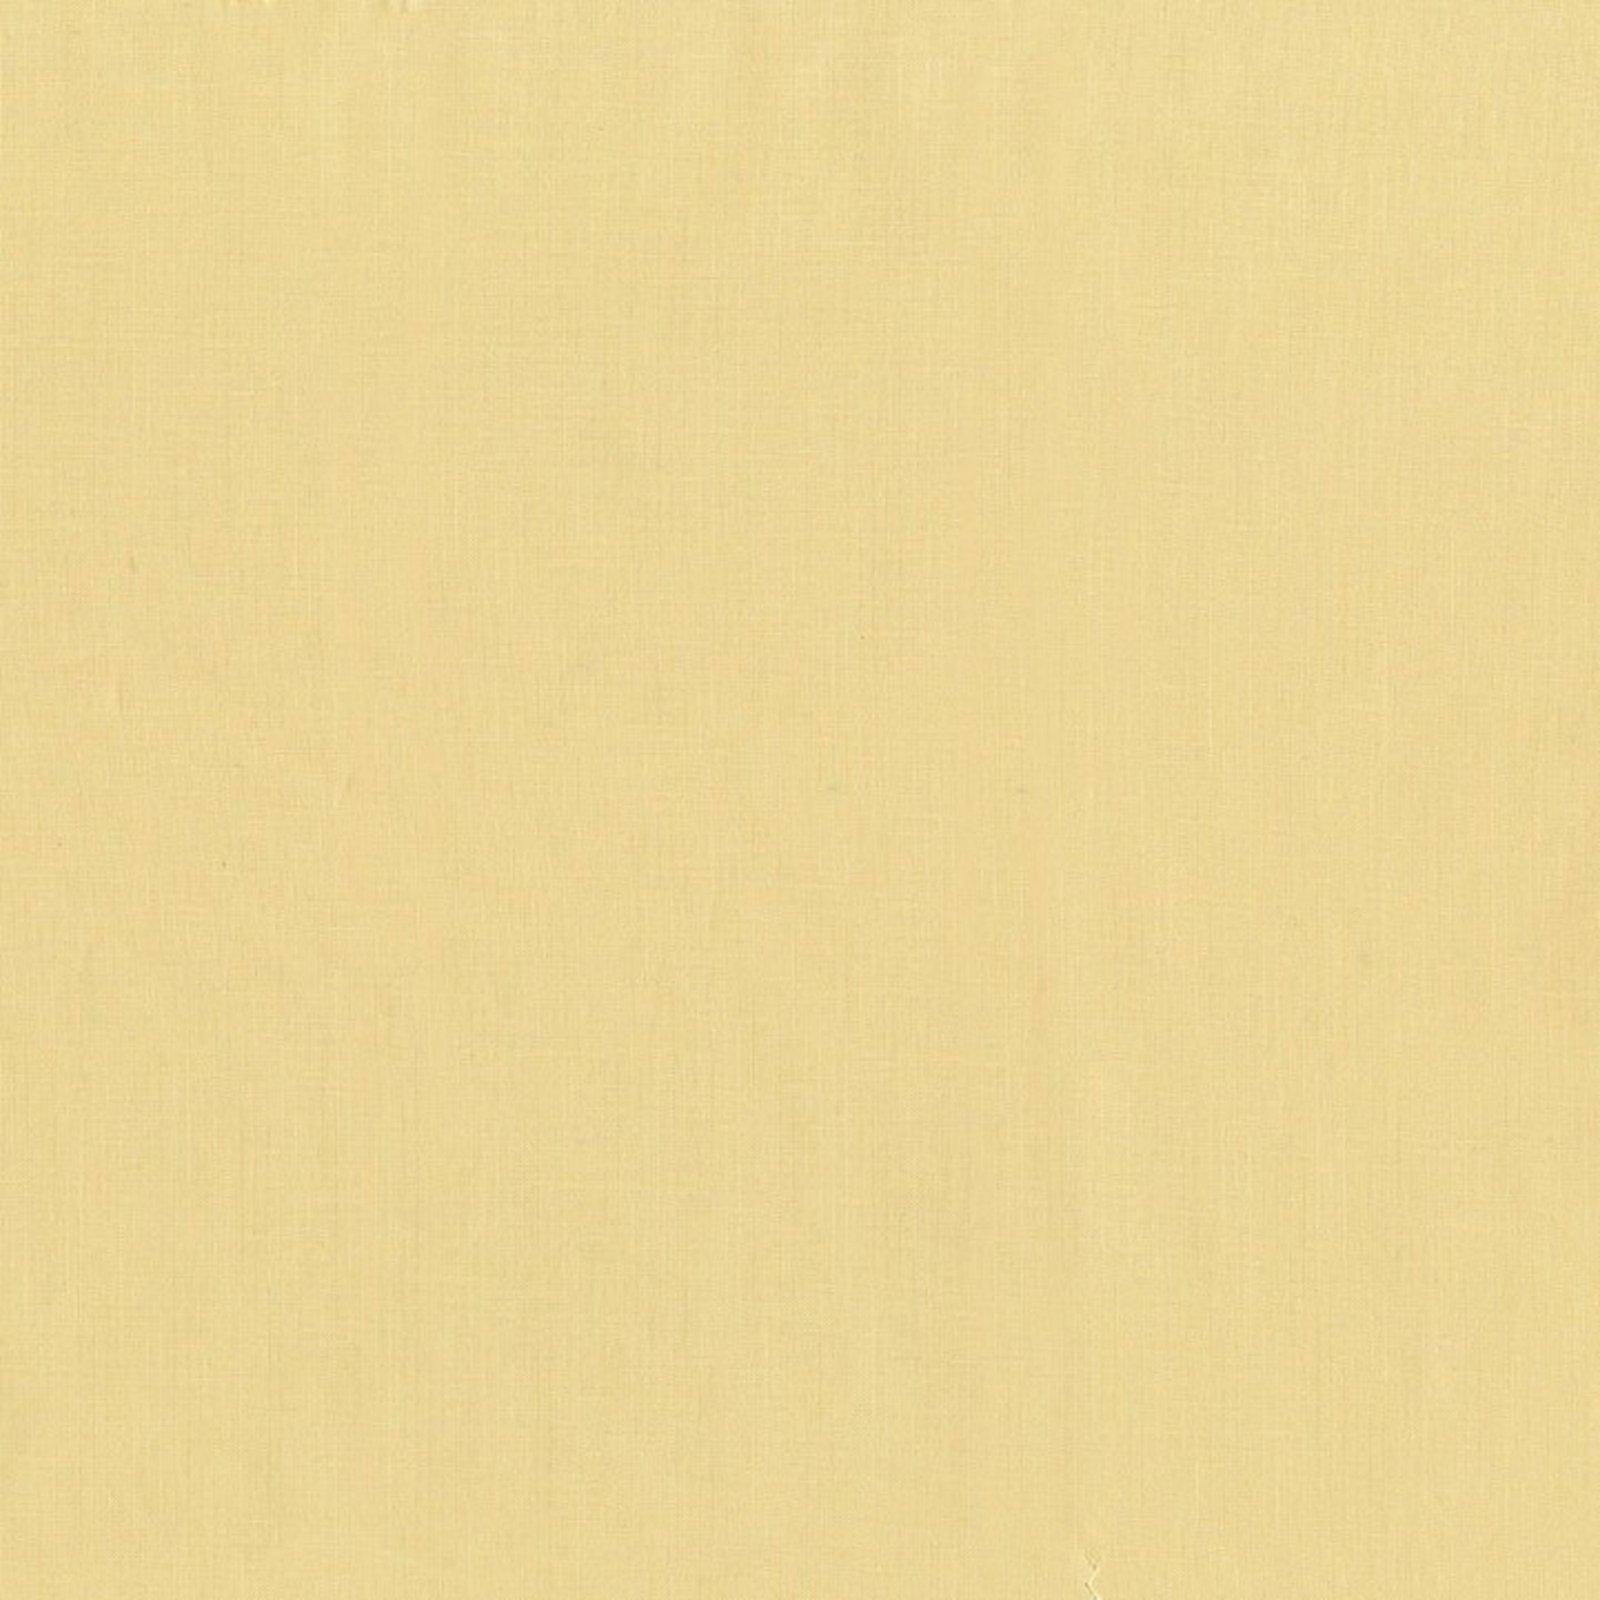 EOB - 1 yard 6 - Cotton Couture - Tan